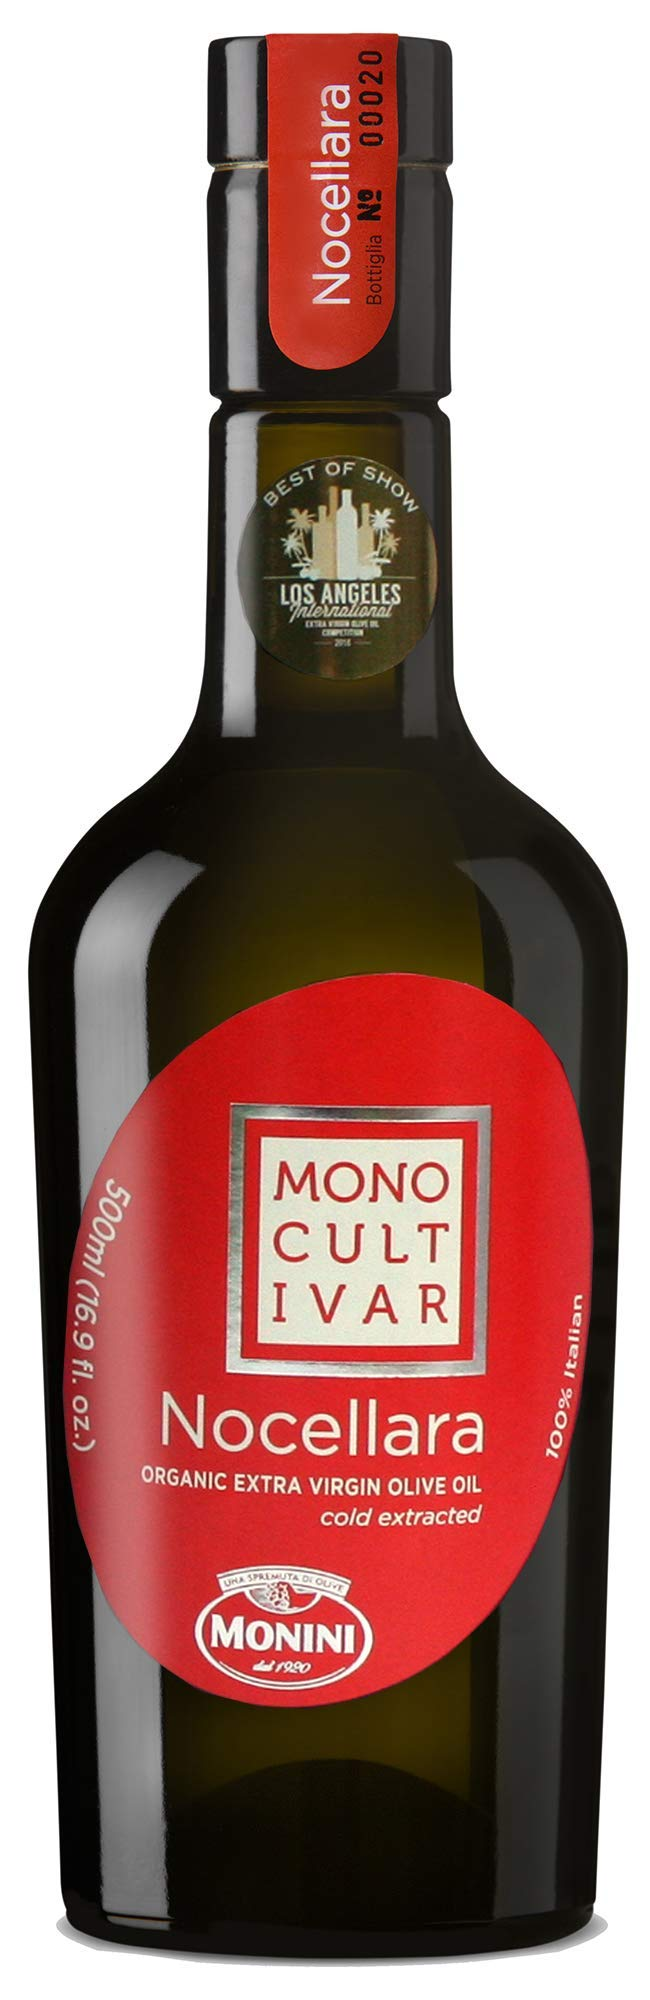 MONINI Monocultivar Extra Virgin Olive Oil   ORGANIC Italian Imported, Premium Quality   Cold Extracted   500ml (16.9oz) (Nocellara)